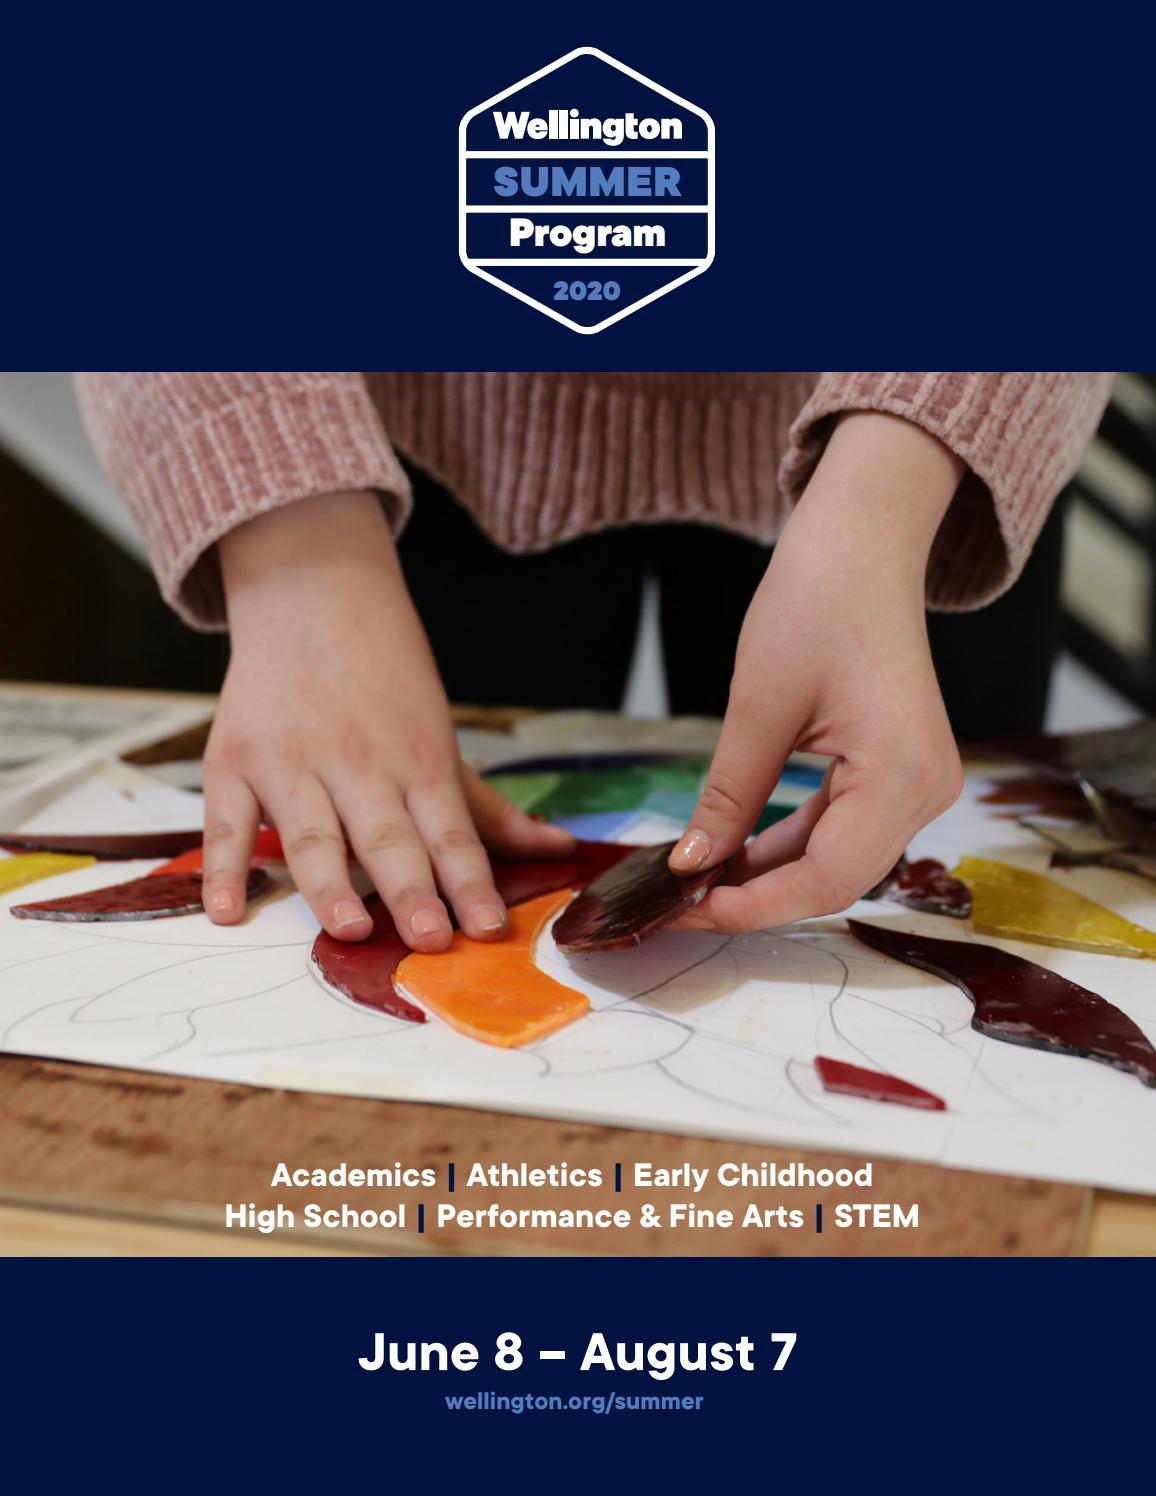 Summer Program Brochure 2020 By Wellington Issuu